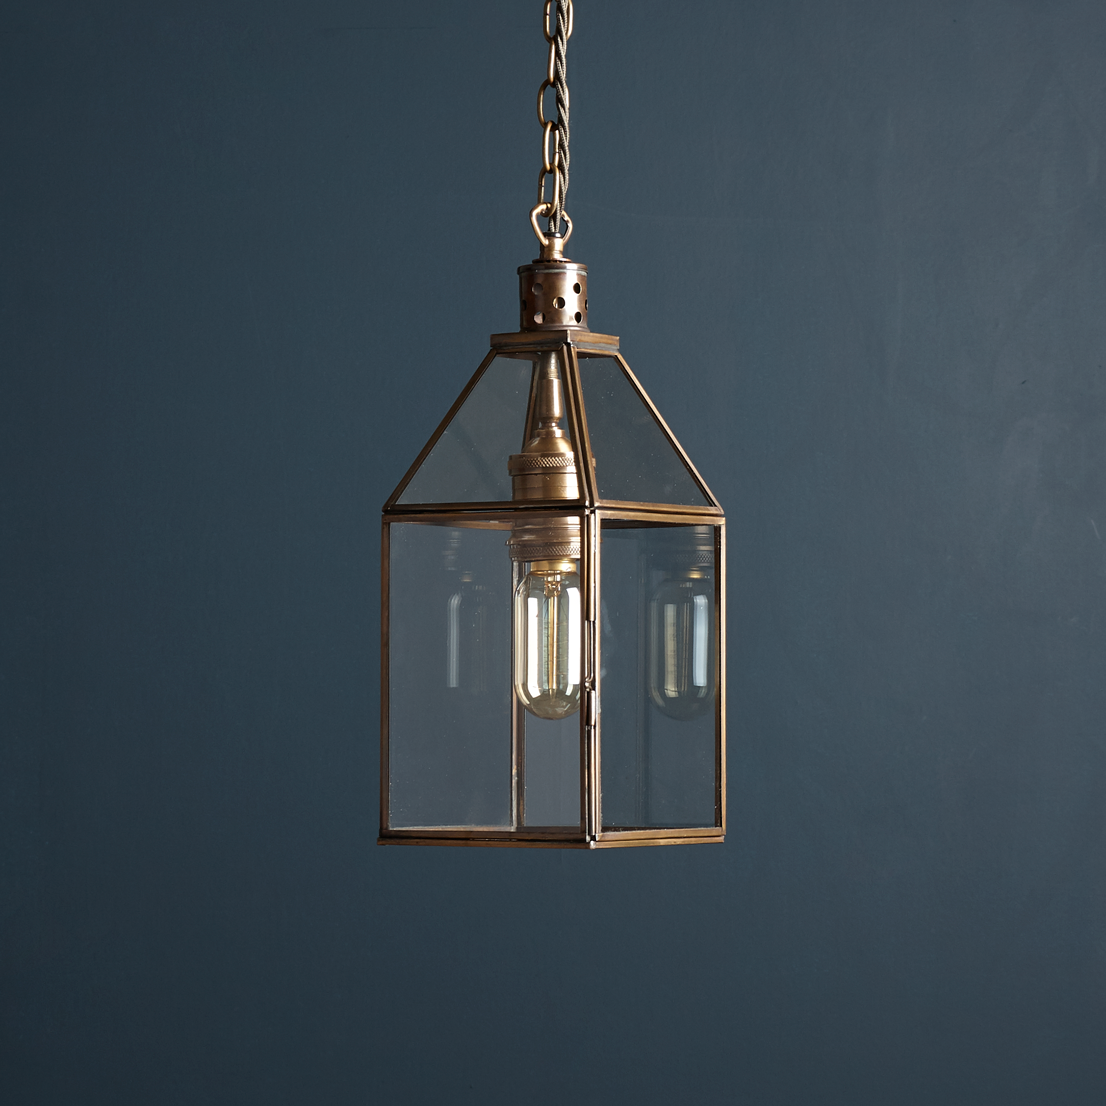 Harrington Lantern Chandelier Small Shades of Light